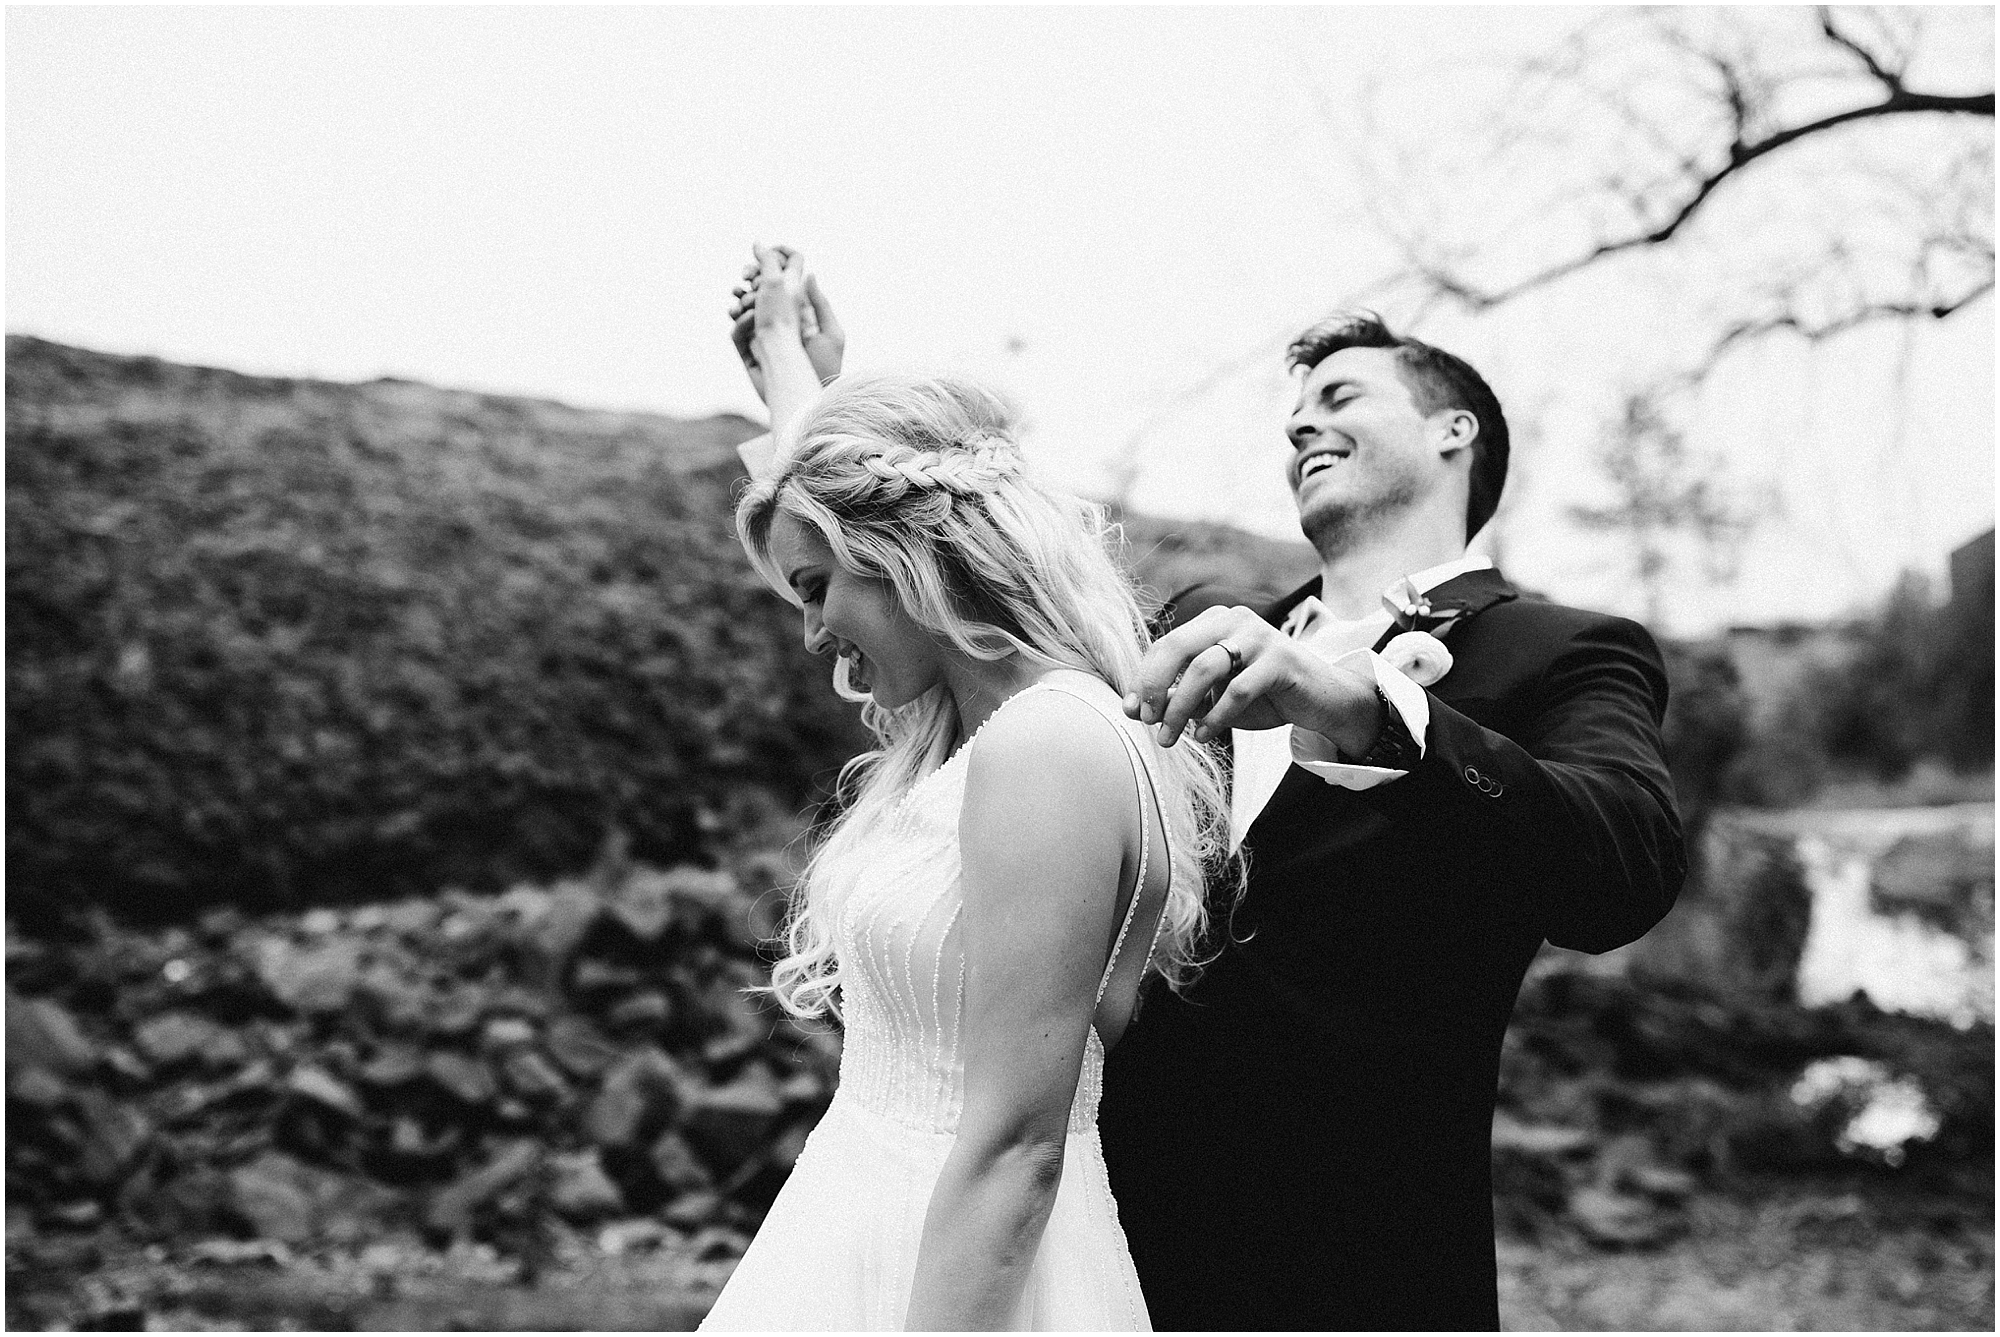 Chateau Rive Spokane Wedding Cassie Trottier Photography1106.jpg